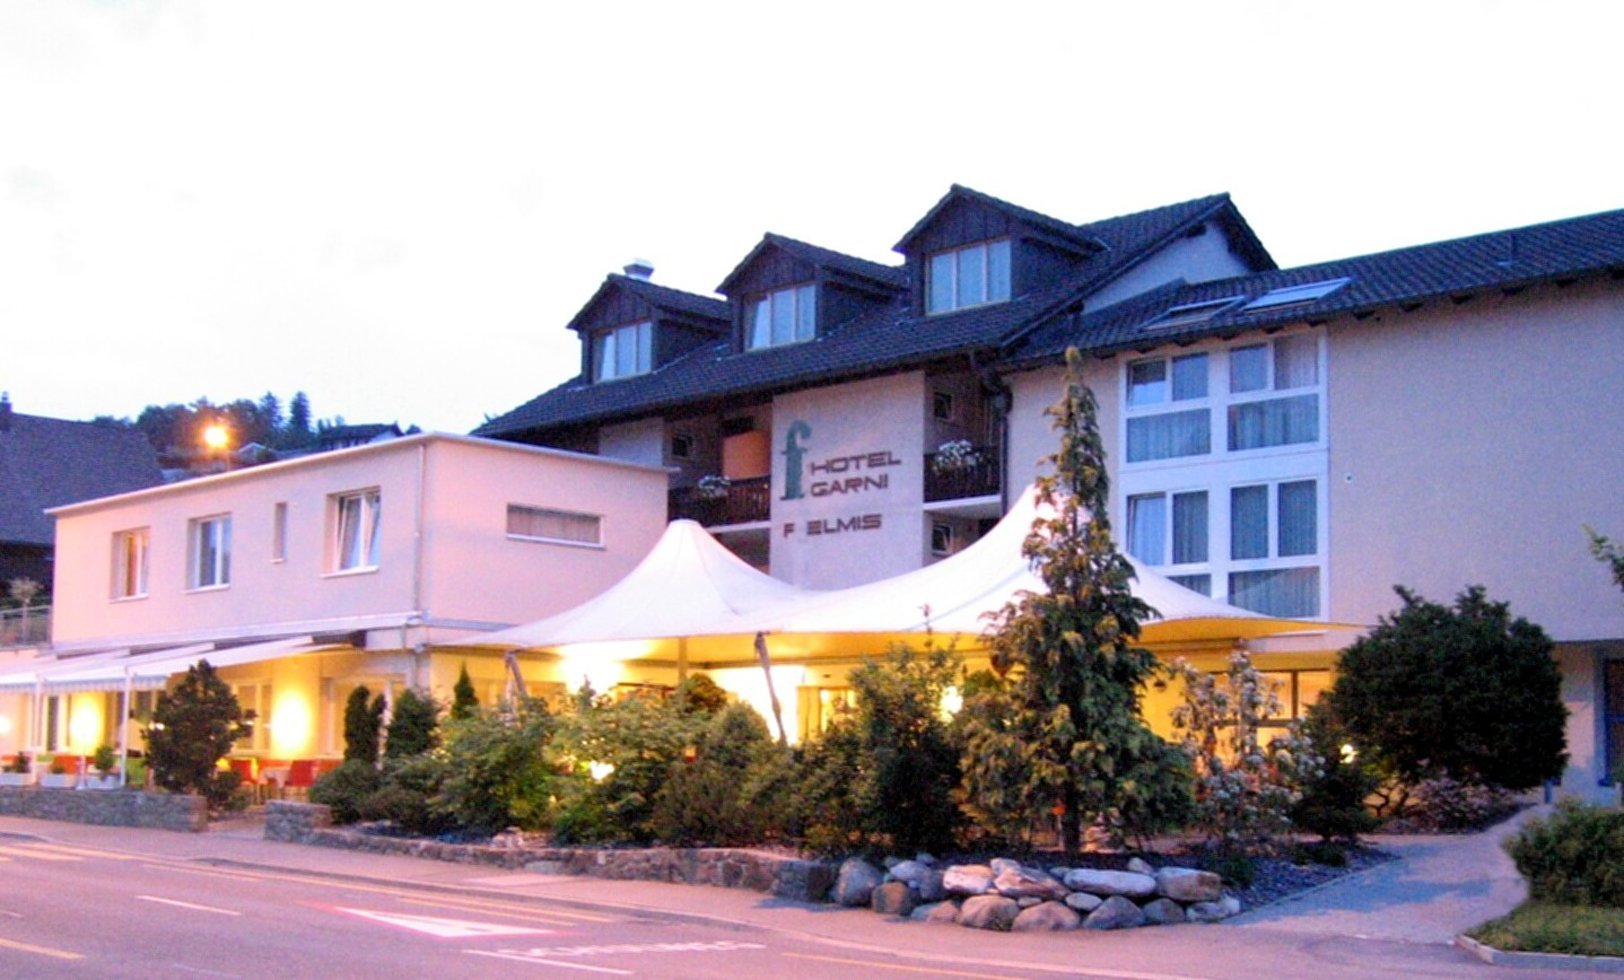 Hotel-Restaurant Felmis